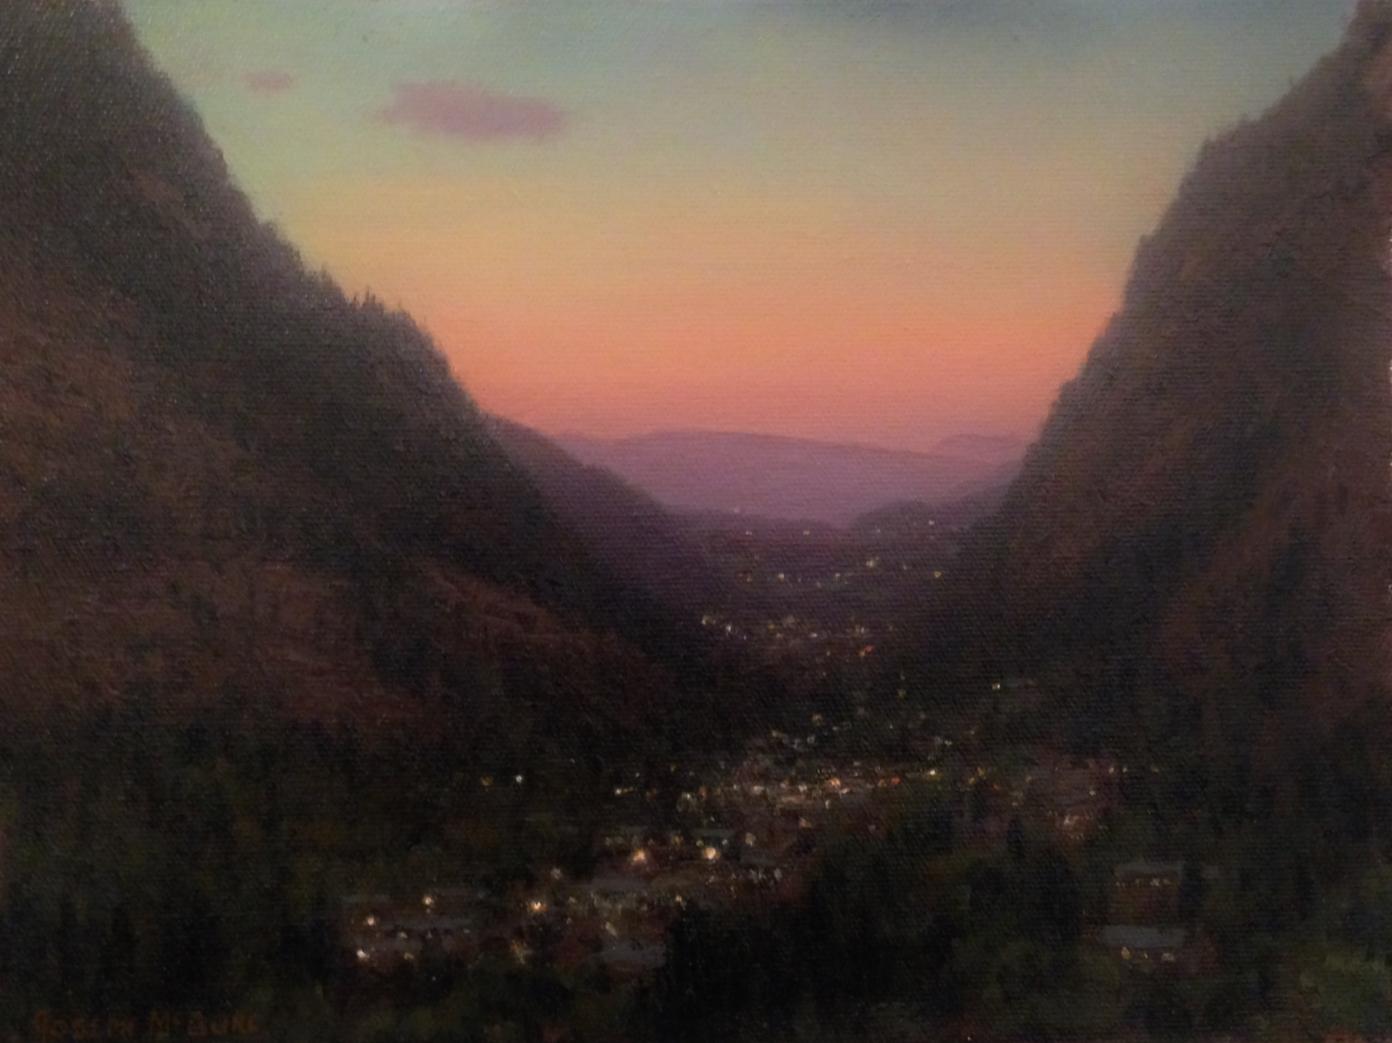 Plein Air, Twilight Comes to a Western Town